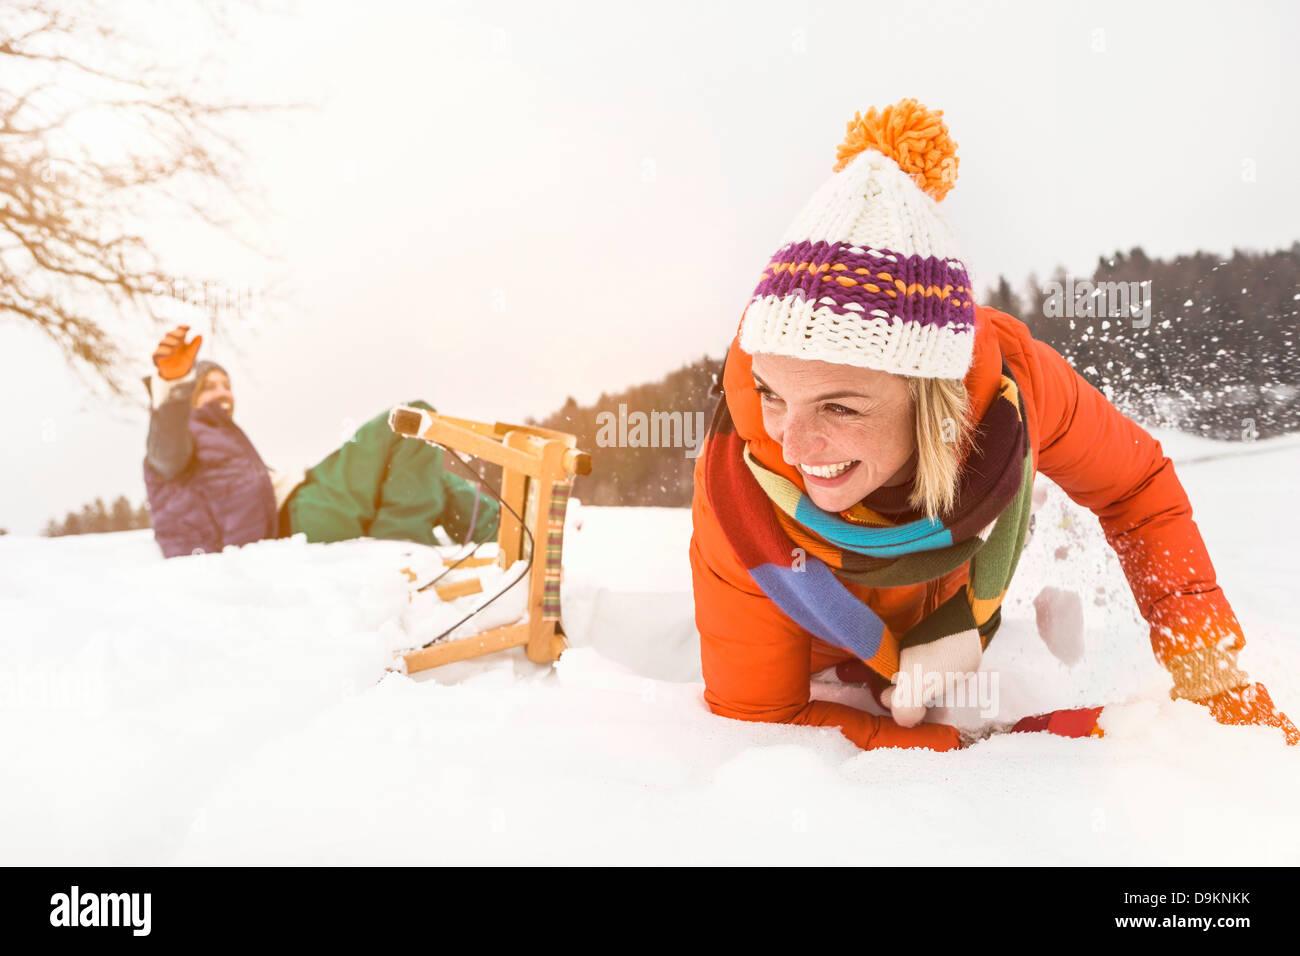 Couple falling off toboggan in snow - Stock Image